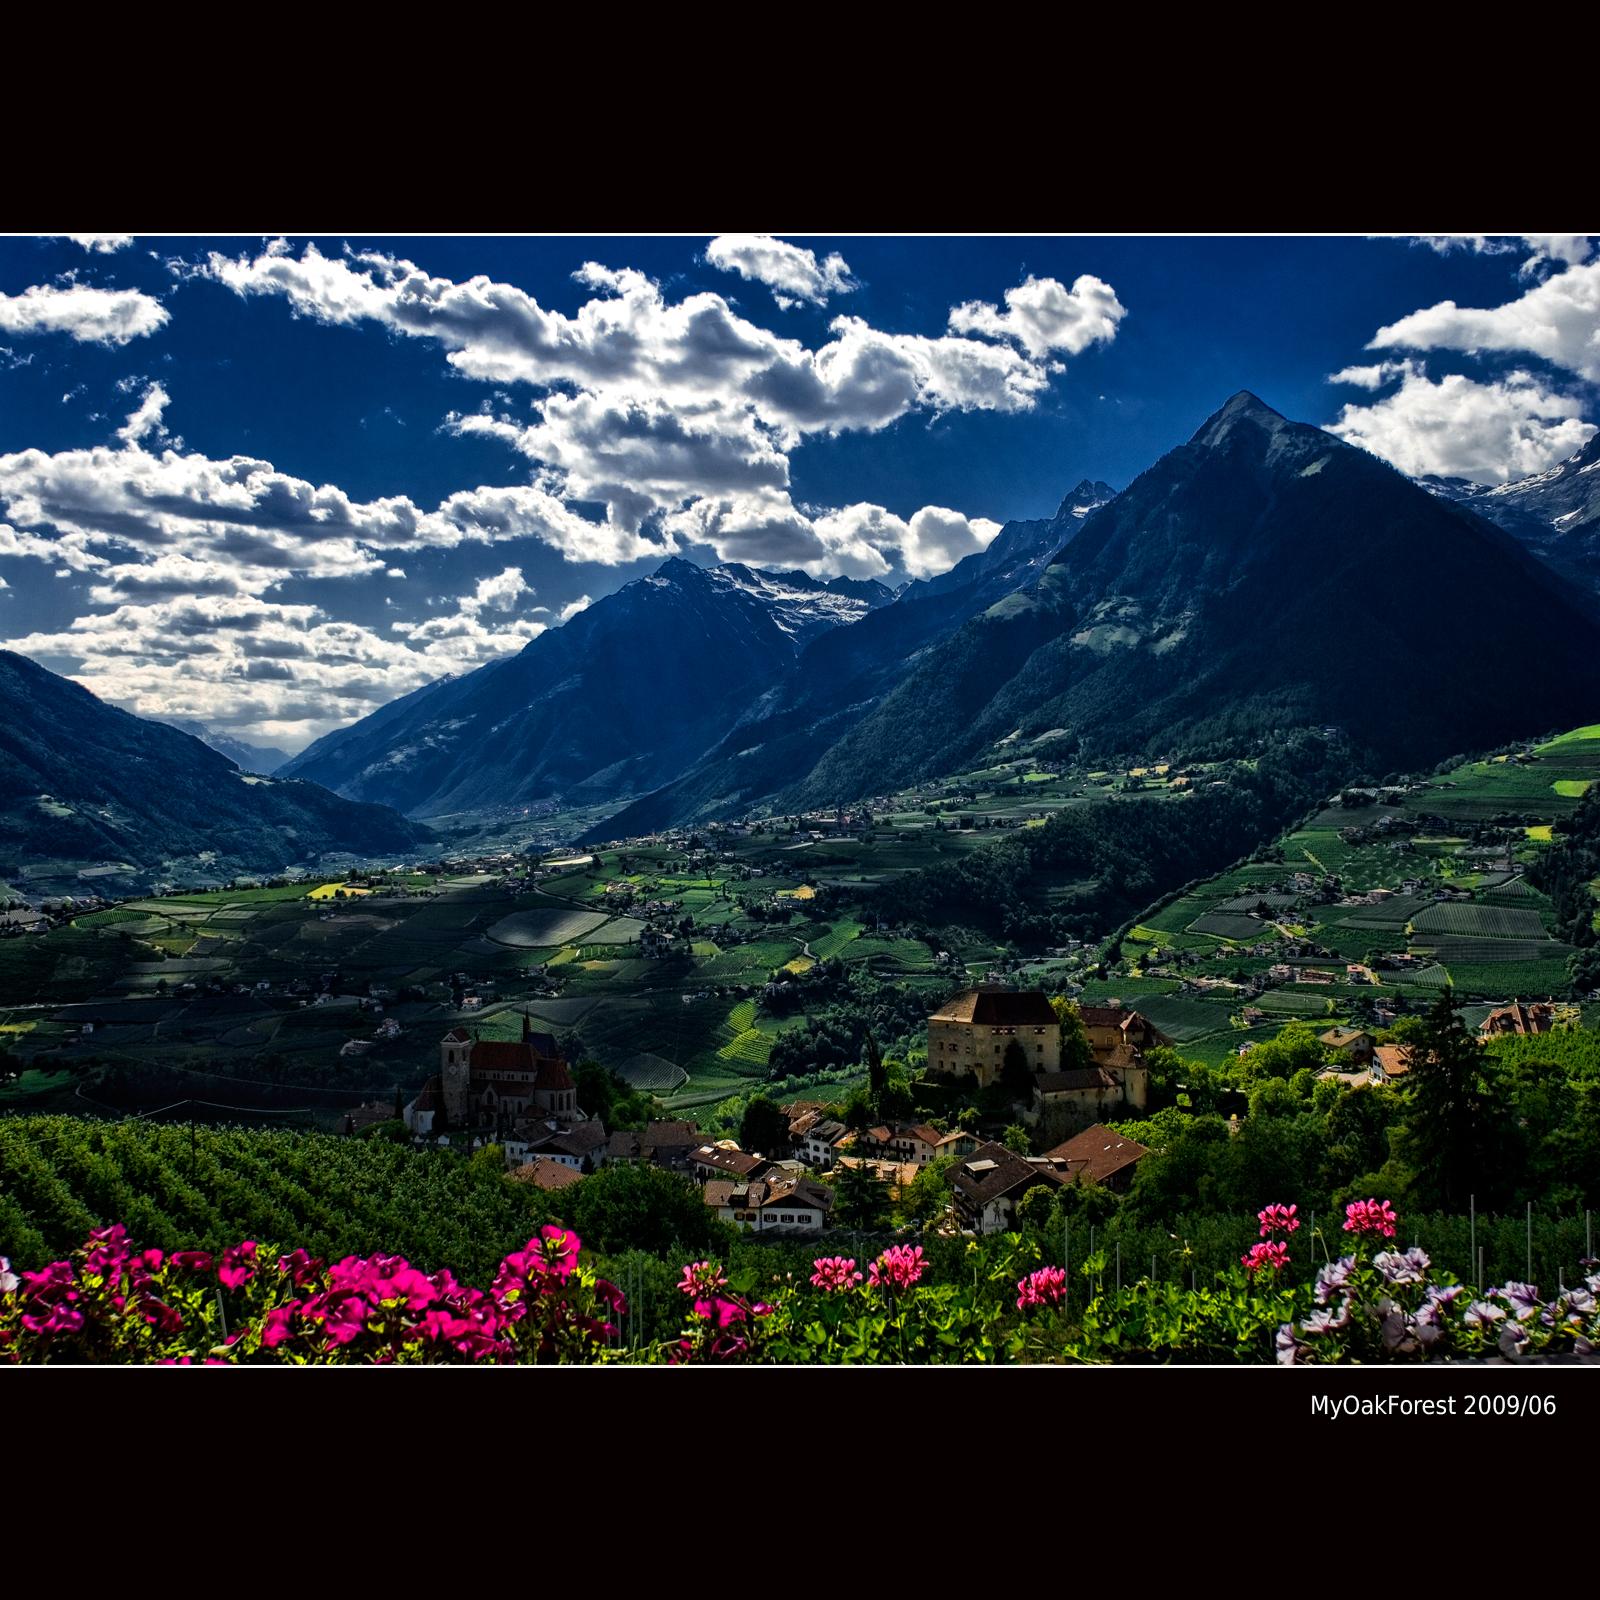 Elevation Map Of Province Of Bolzano South Tyrol Italy